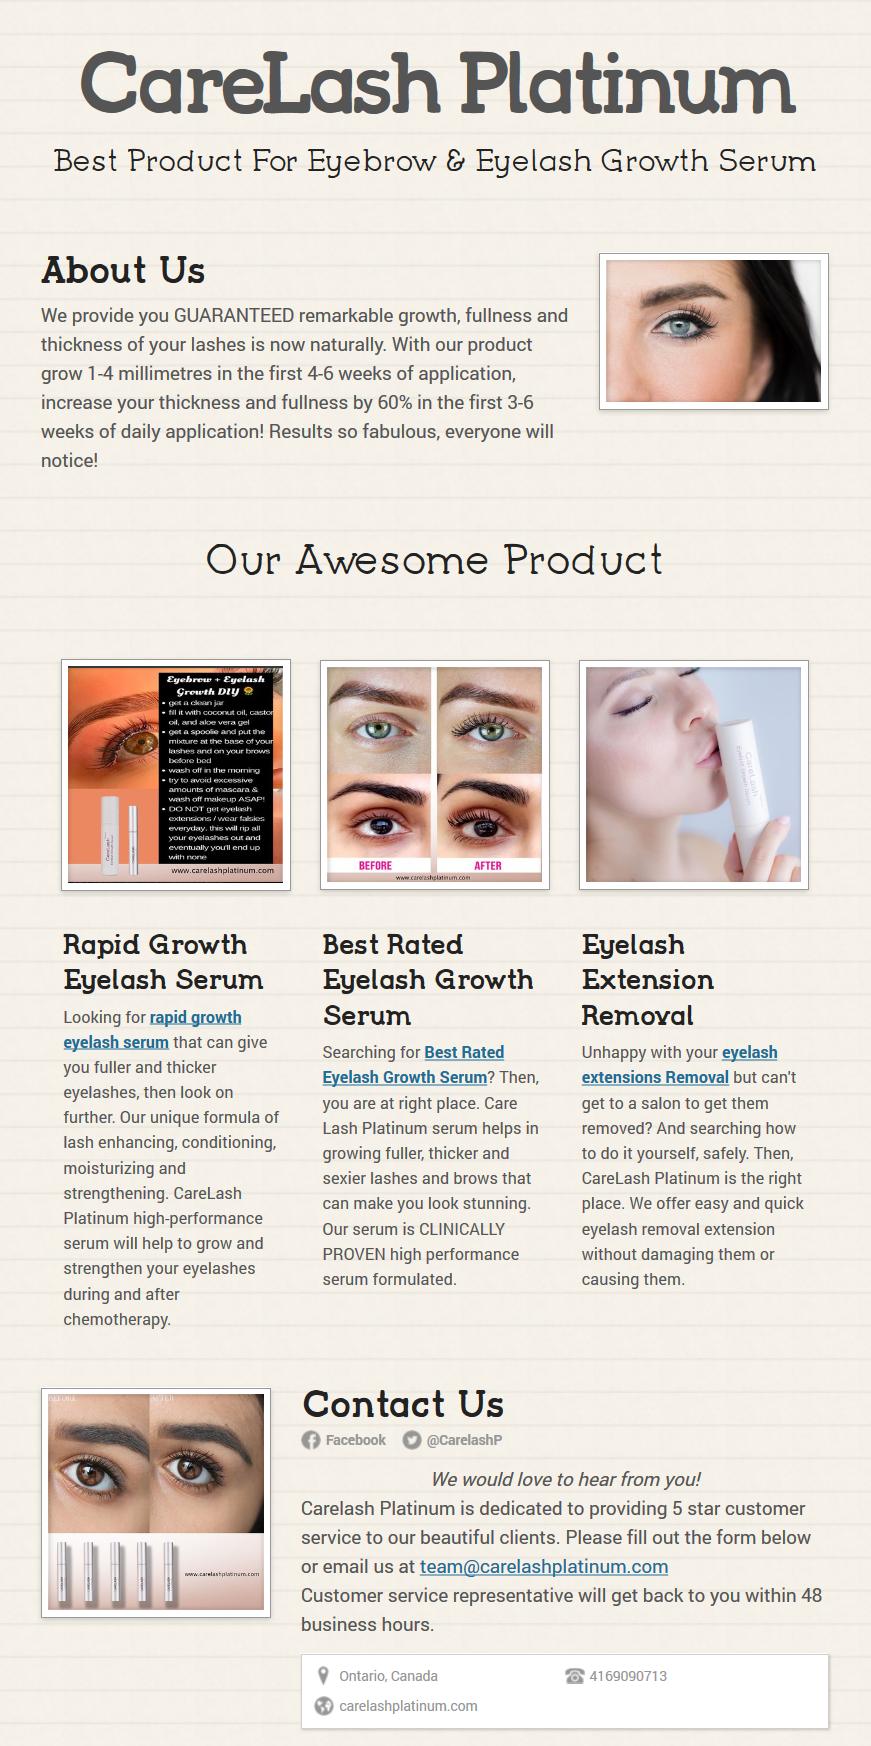 c0be596627f Eyelash Extension Removal, Eyelash Extensions, Best Eyelash Growth Serum,  Eyelashes, Lashes,